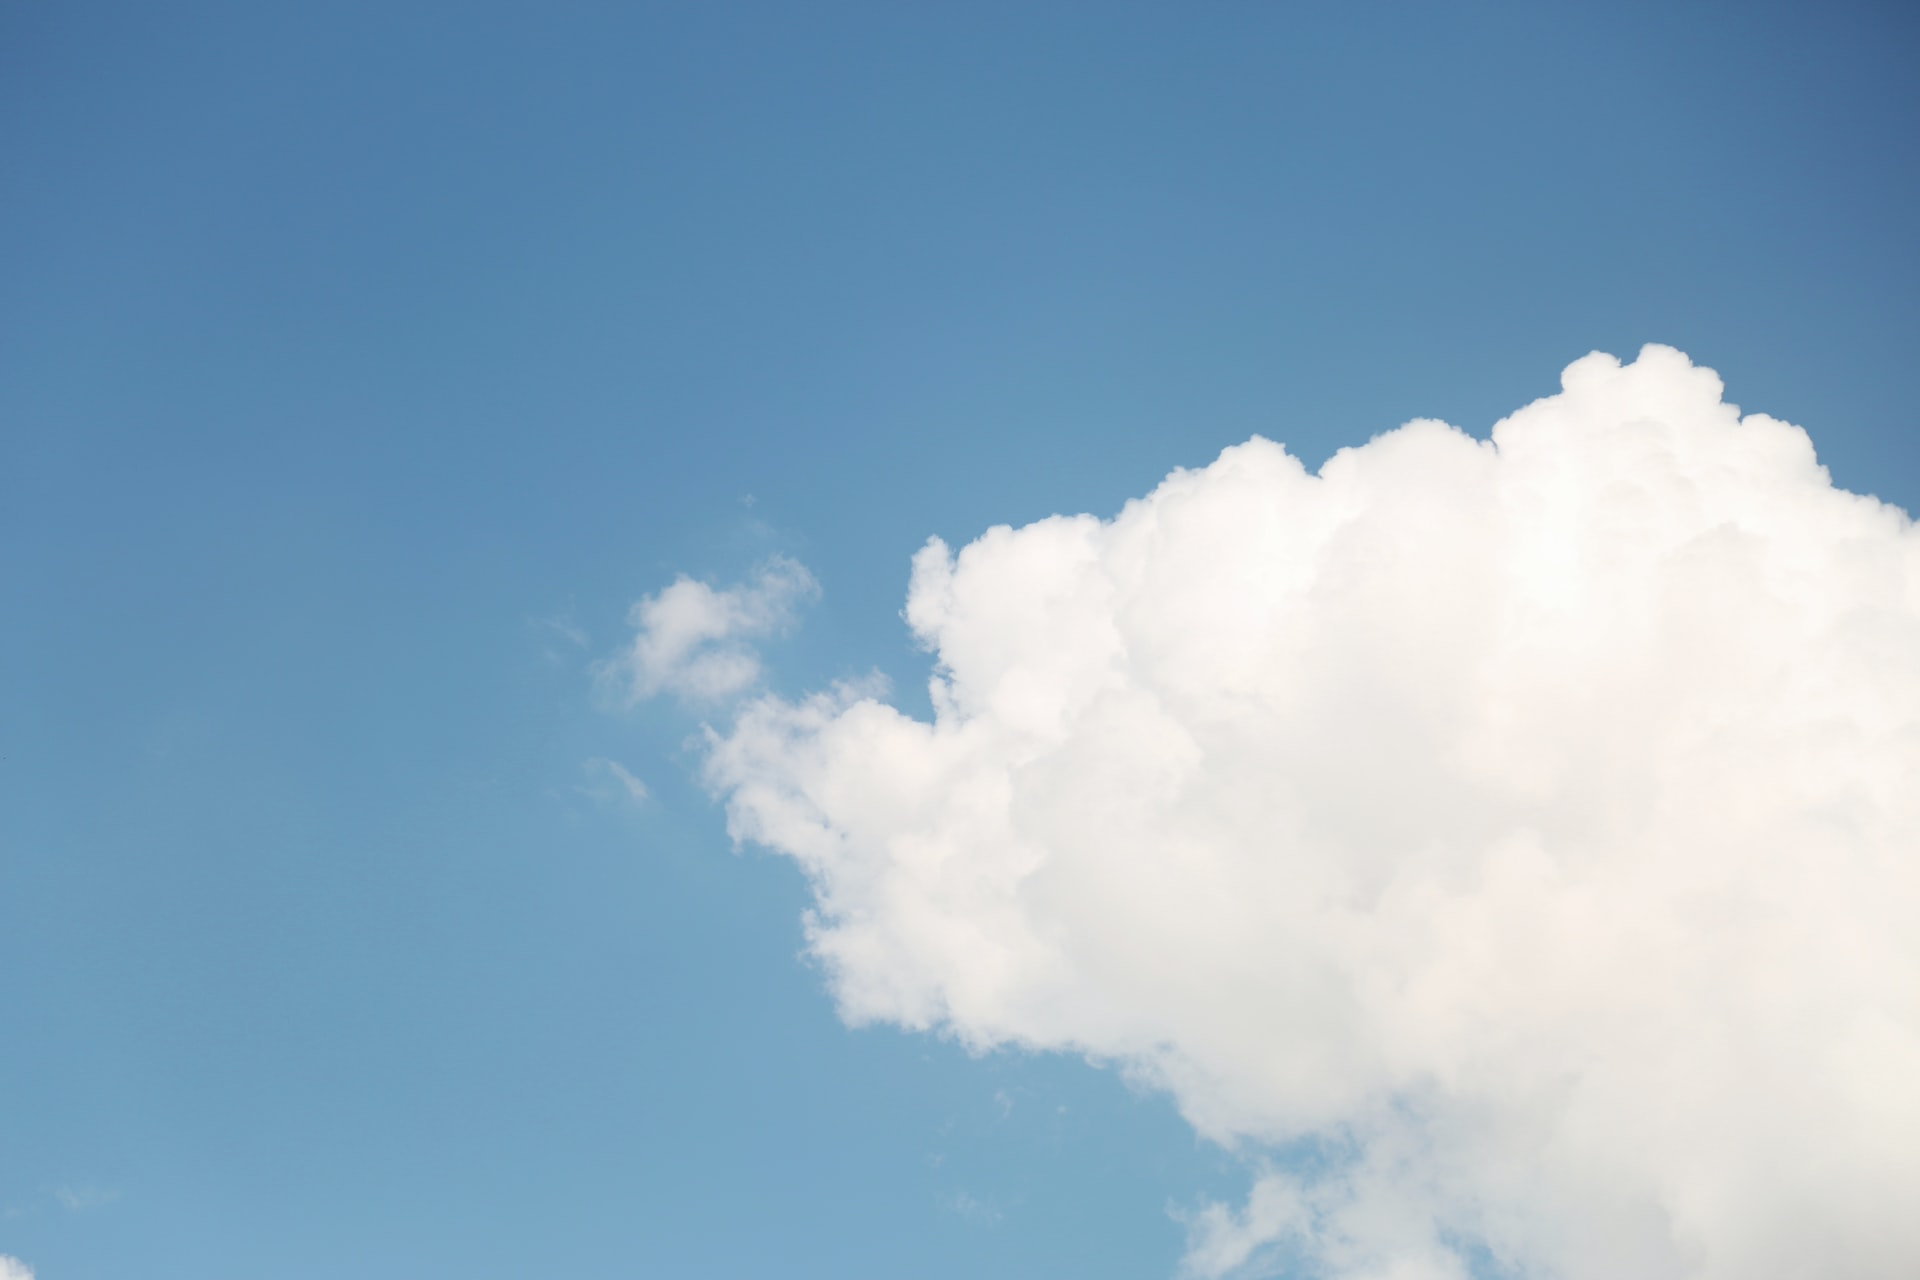 aziz ayad azure devops cloud